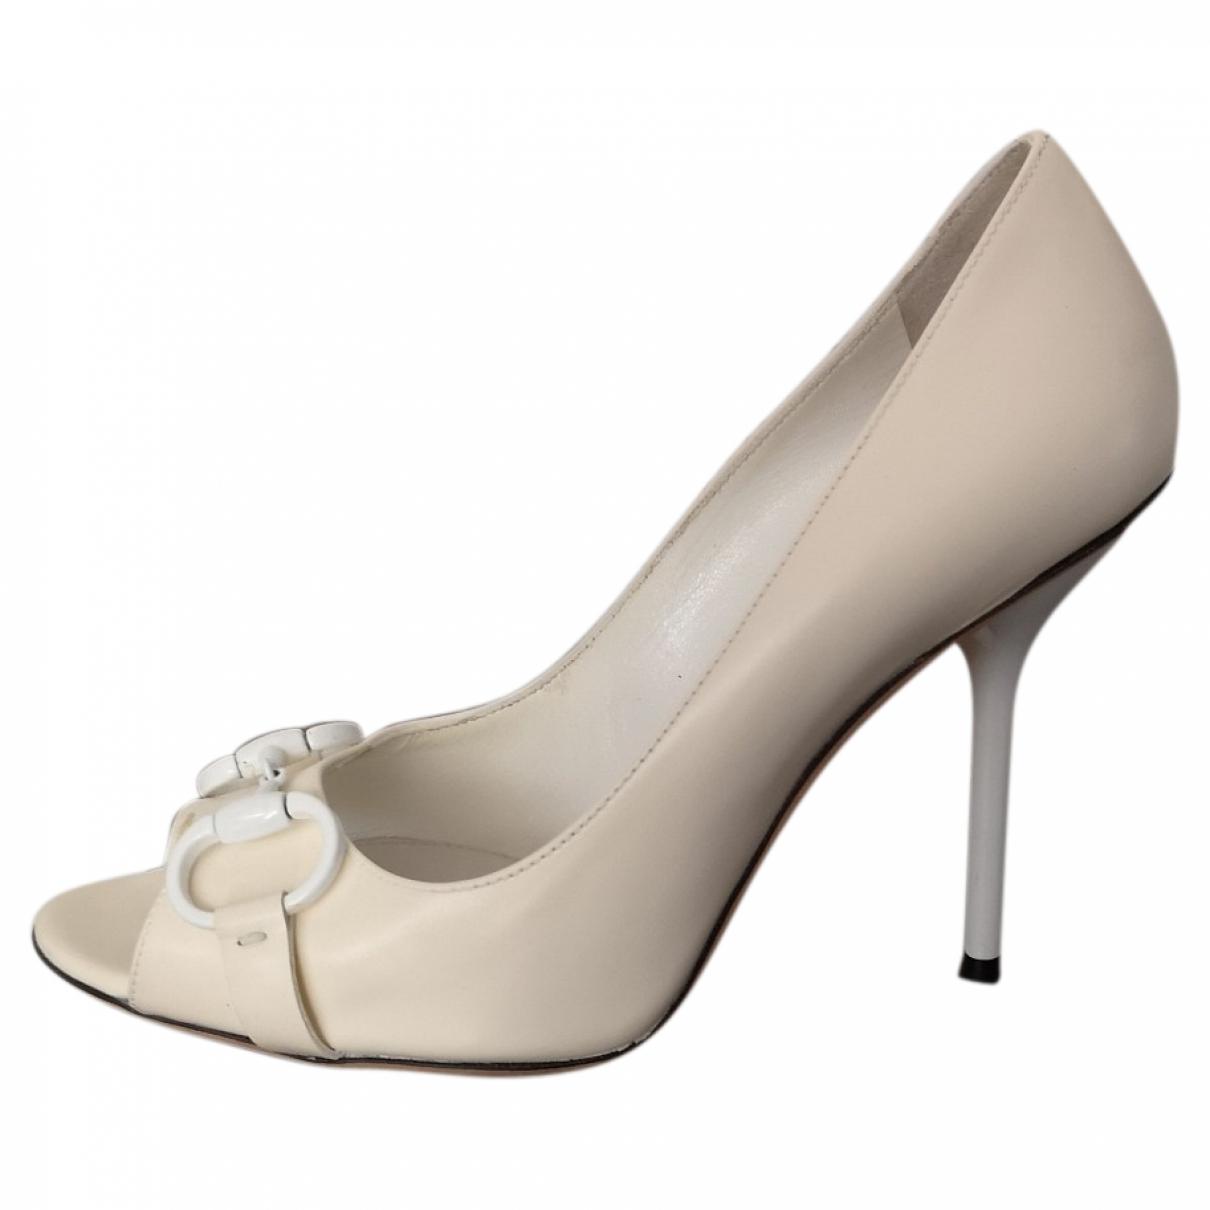 Gucci \N White Leather Heels for Women 37.5 EU